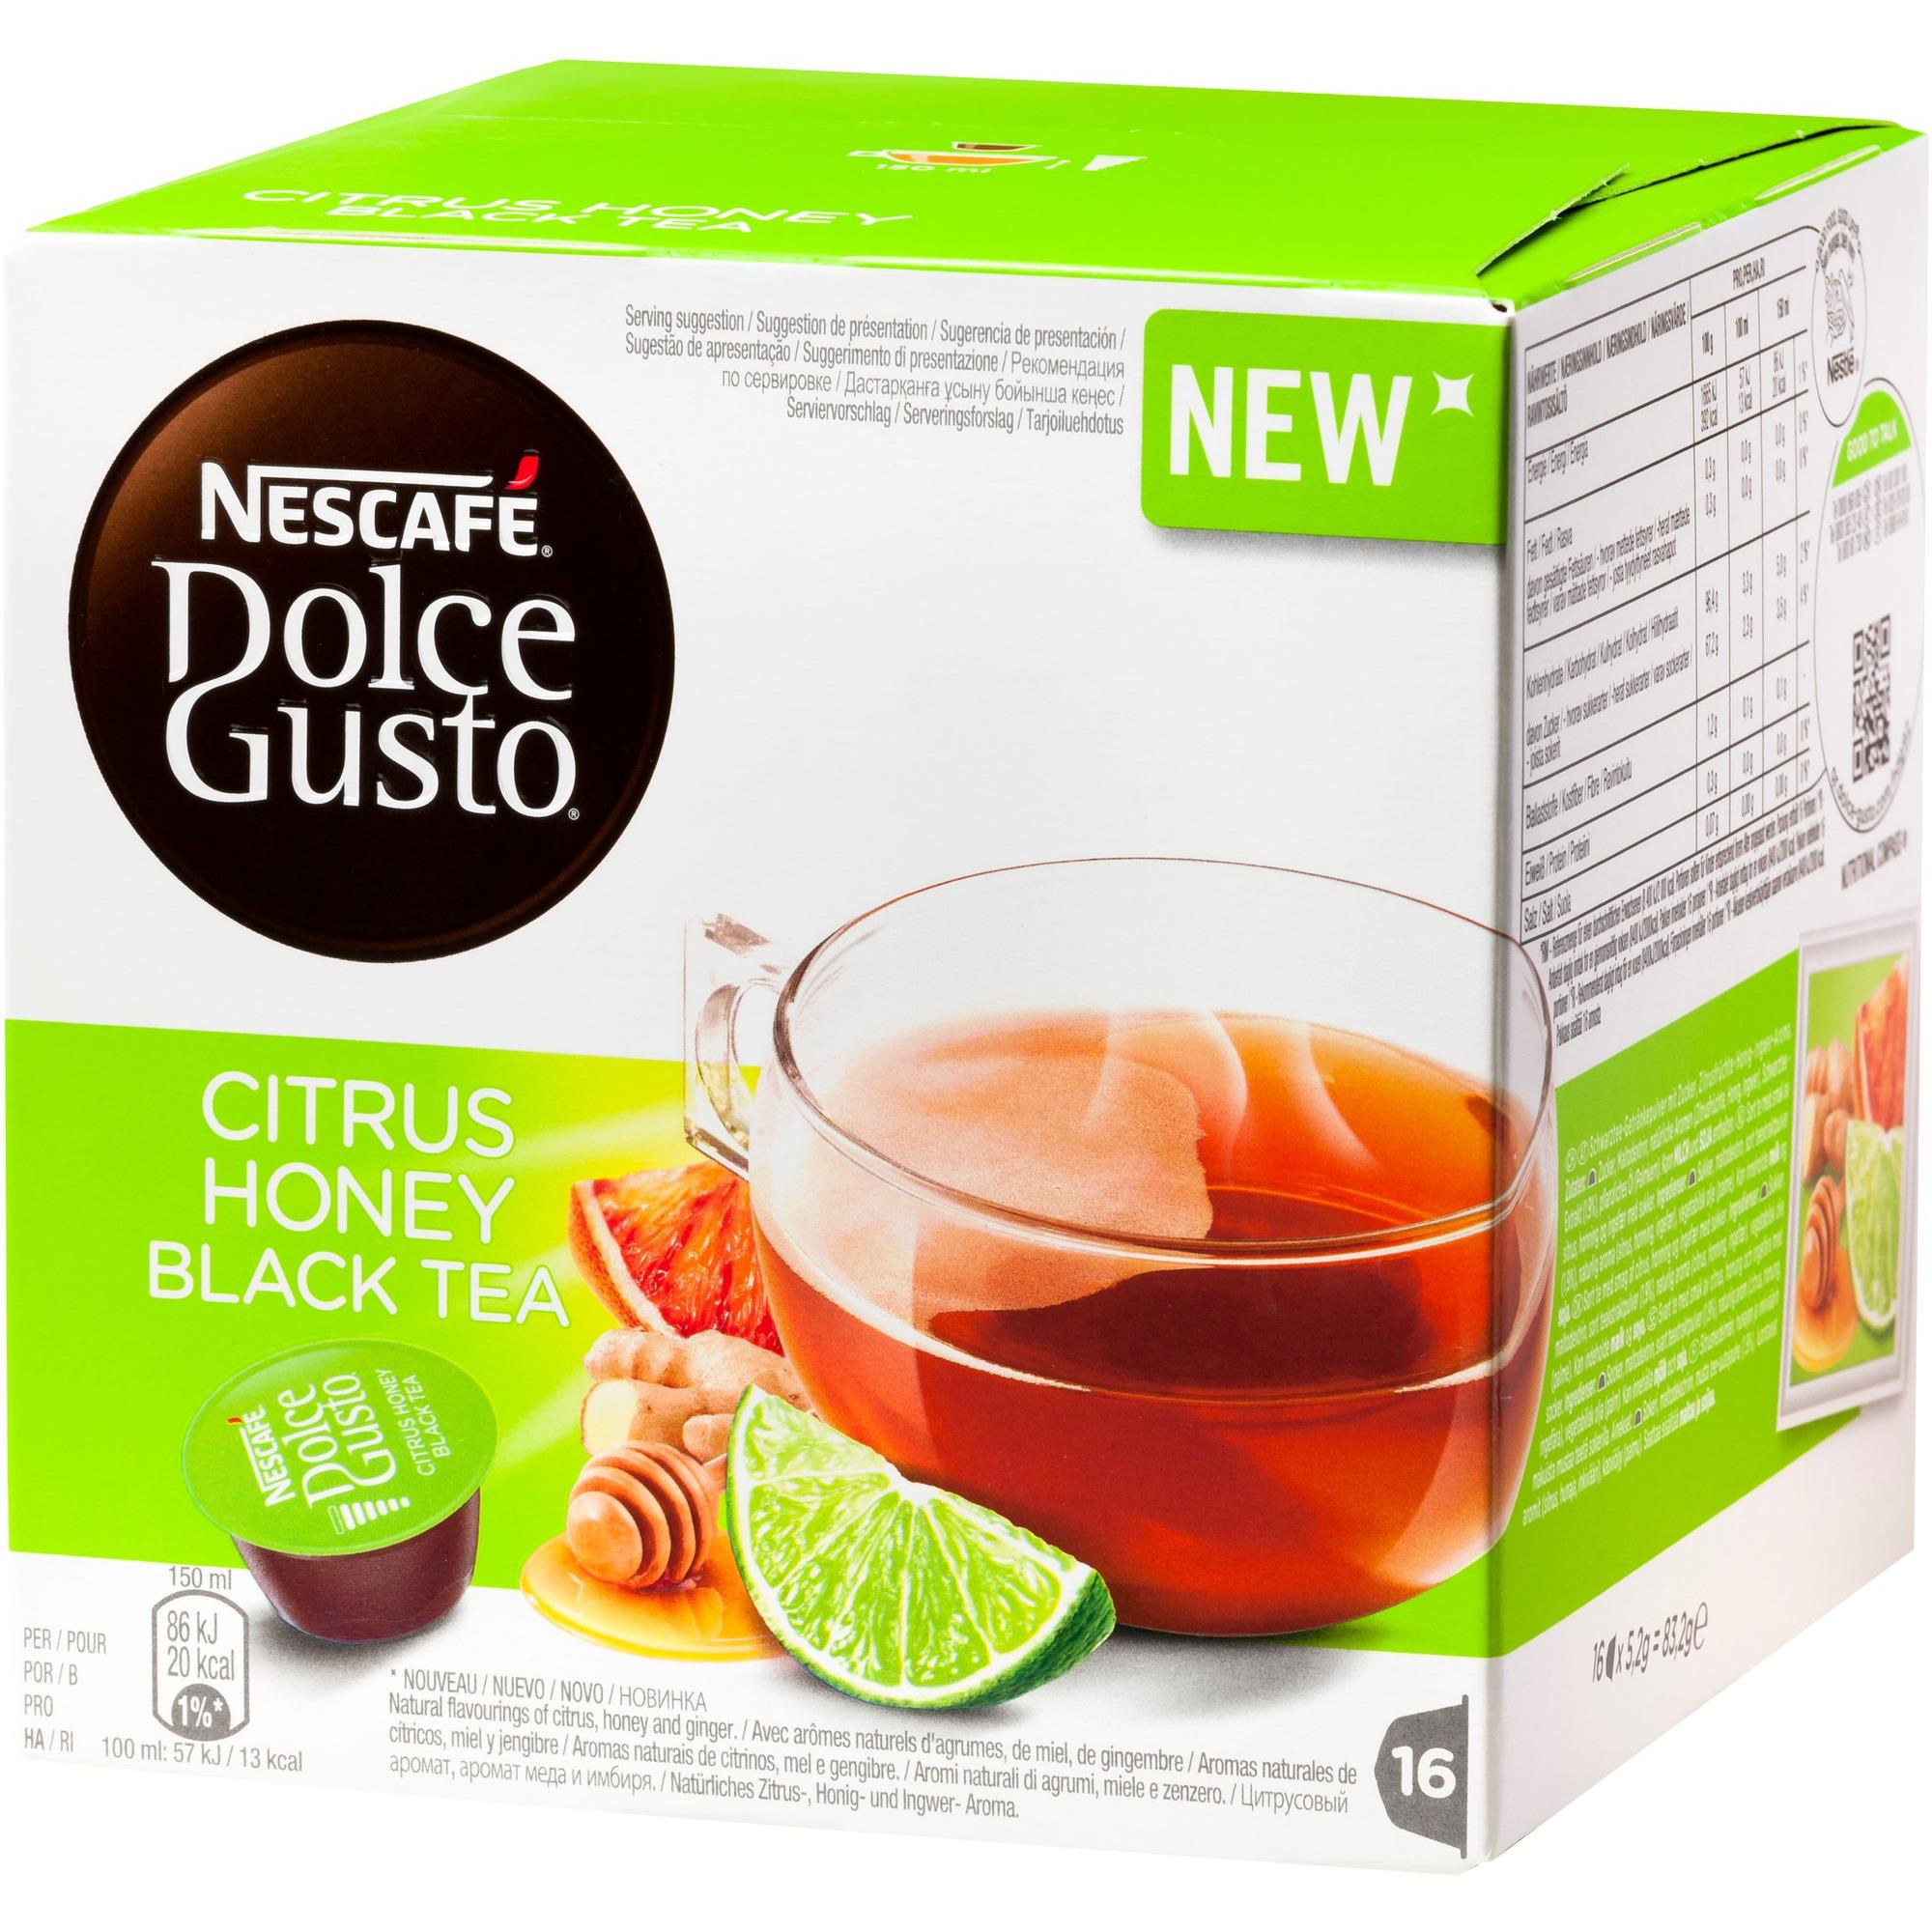 Nescafé Dolce Gusto Citrus Honey Black Tea Kapslar